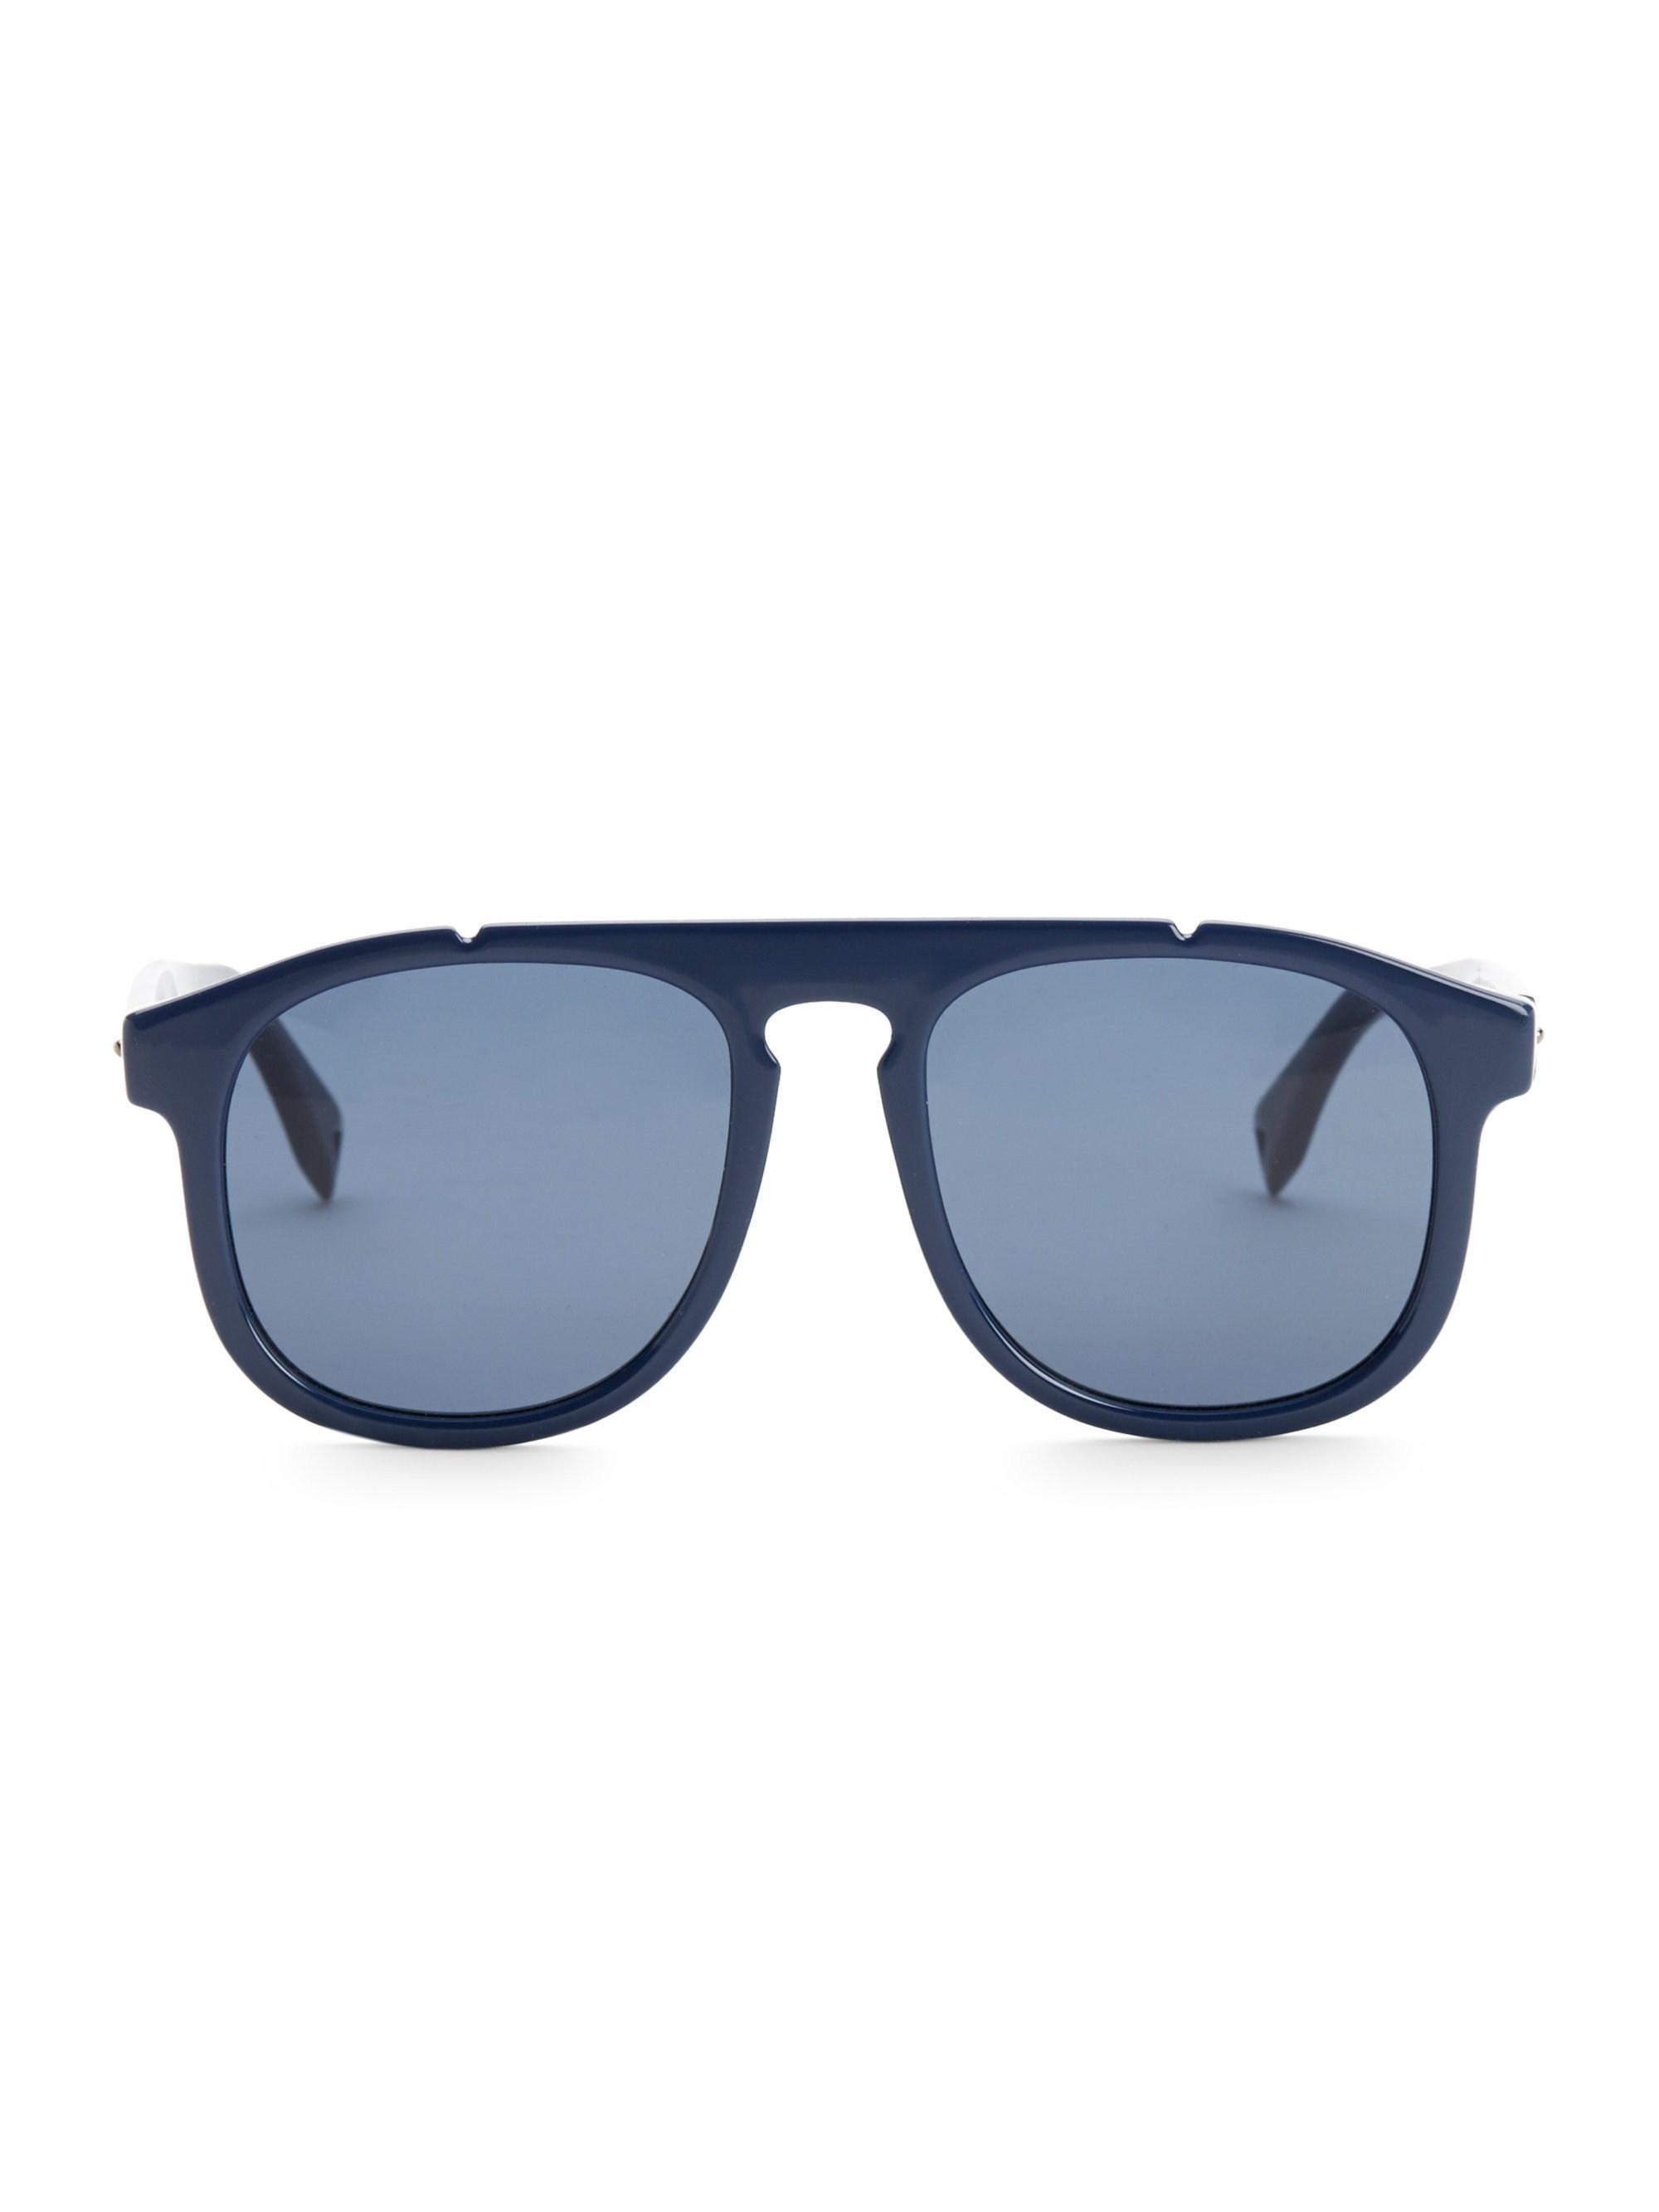 5e9d4419926 Fendi. Blue Men s 54mm Pilot Sunglasses - Dark Havana.  295 From Saks Fifth  Avenue